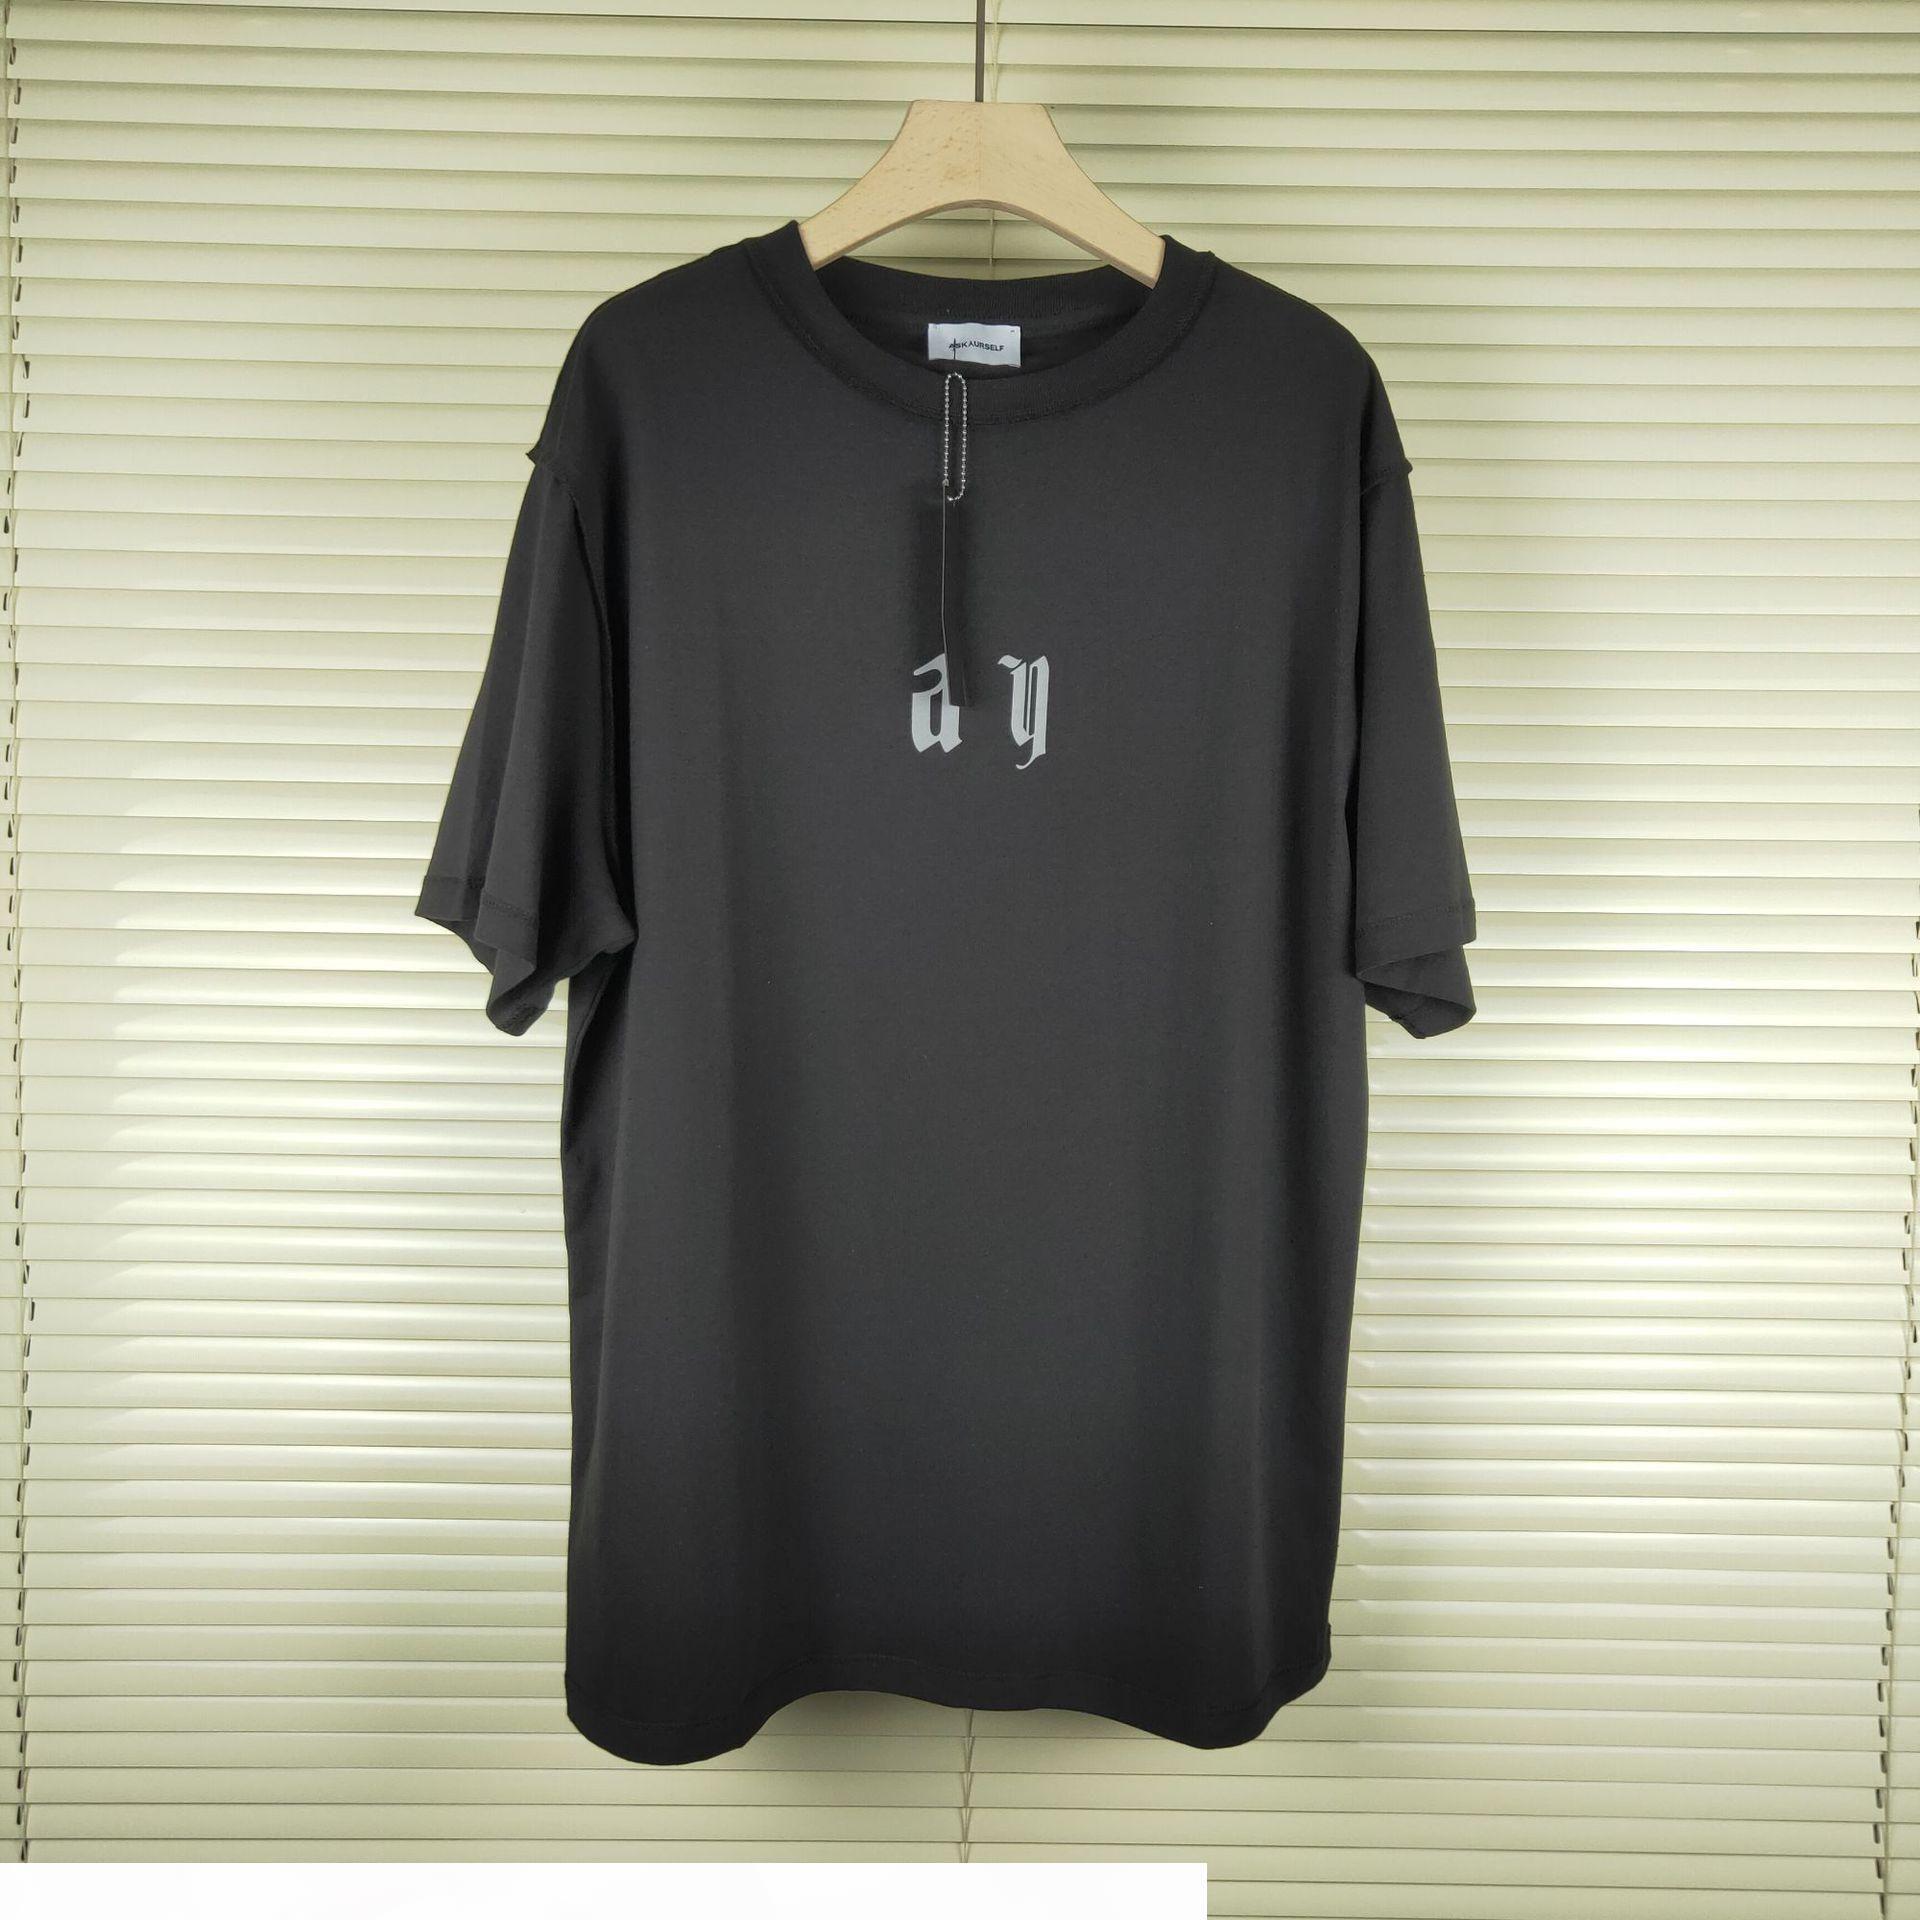 Mens Tshirt Reflective High Street Street manica corta Collo girocollo stampa Moda Solid Tshirt Taglia S-XL